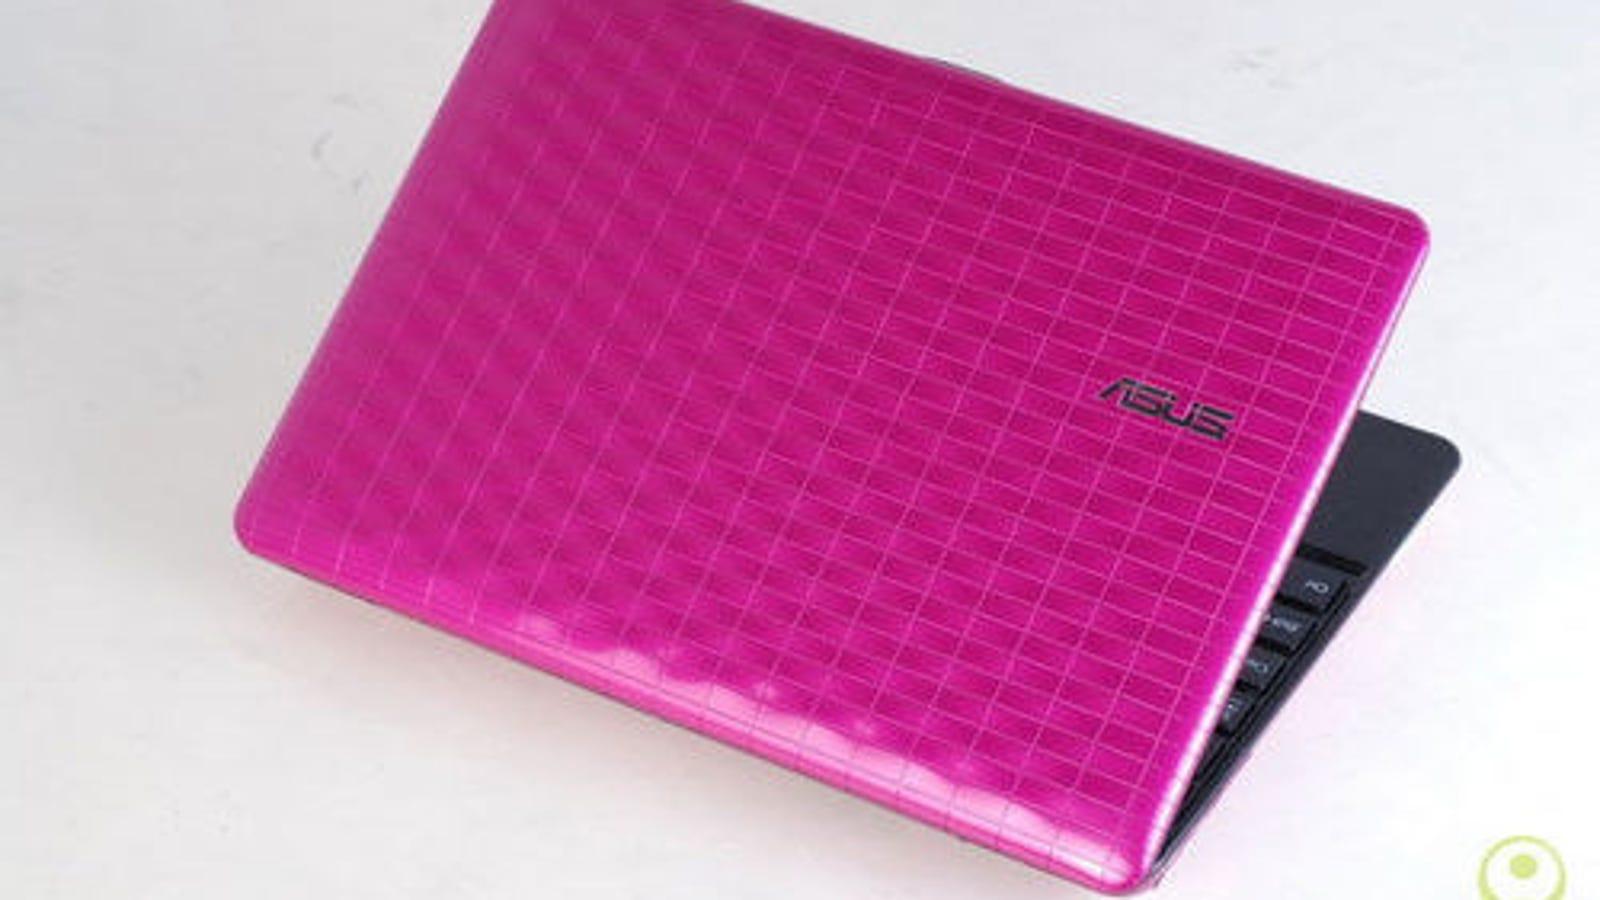 Asus Eee PC 1008P Netbook: Next-Gen Atom N450 Processor ...